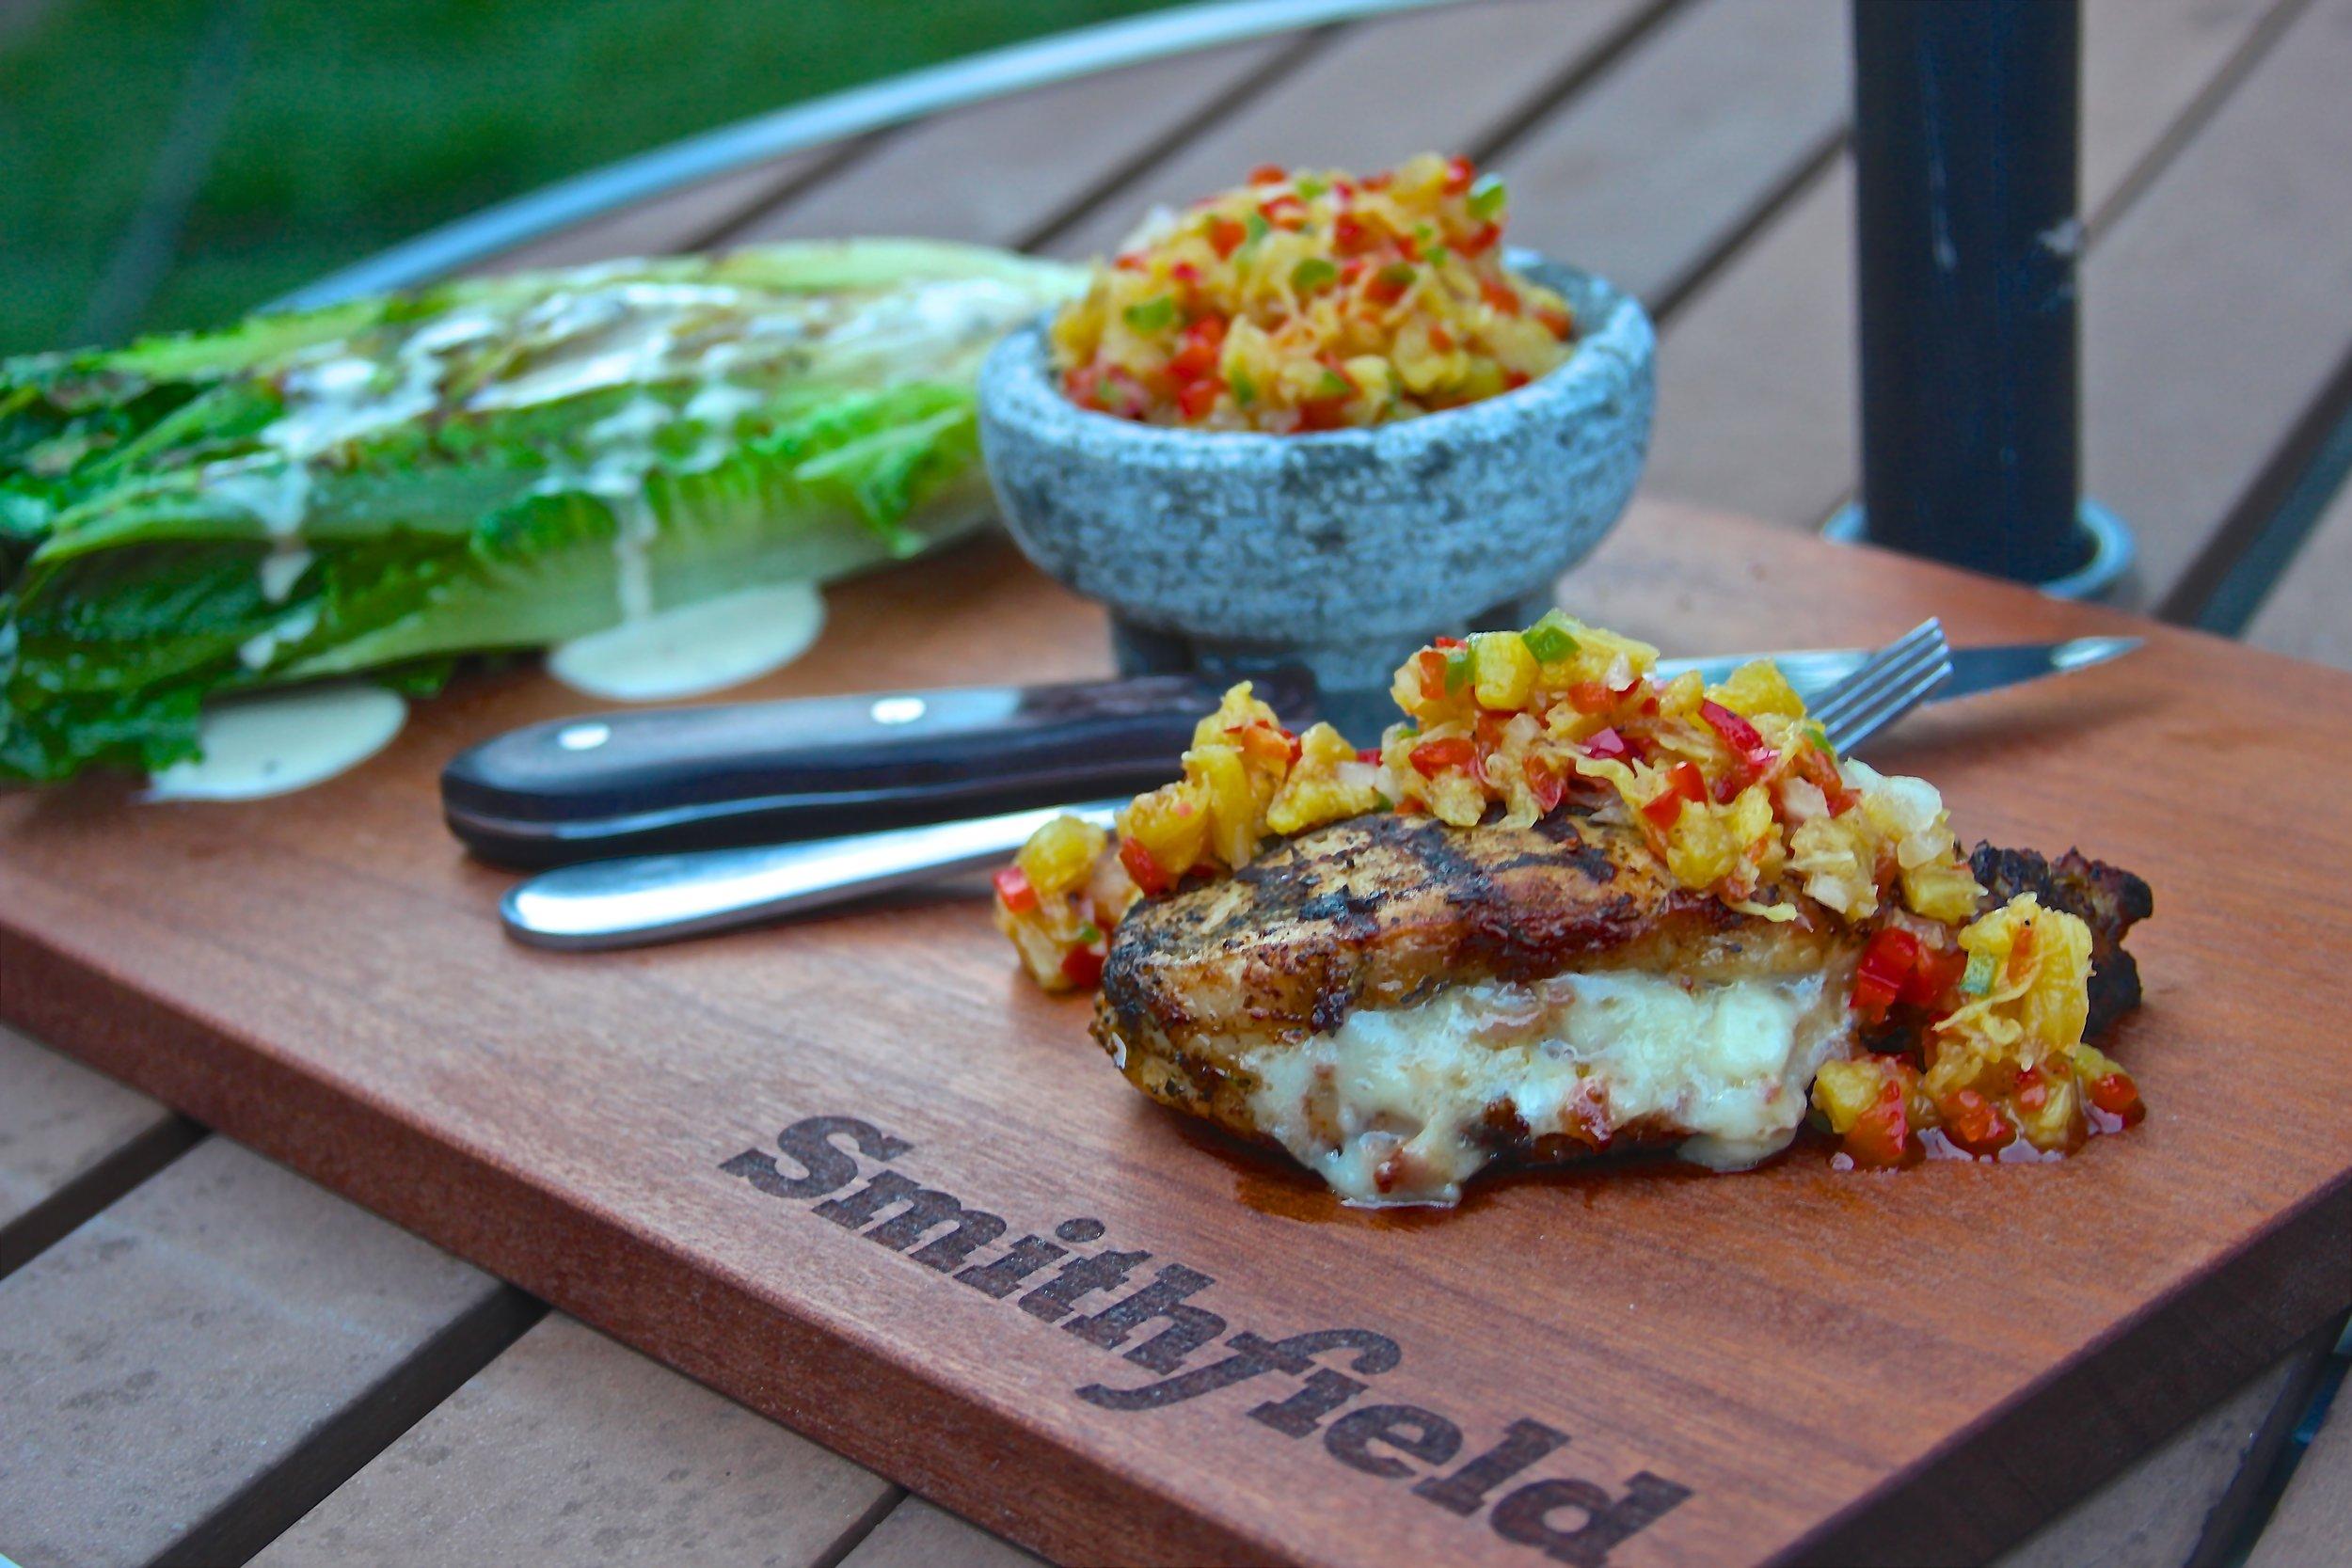 Stuffed Smithfield Roasted Garlic and Herb Pork Chops